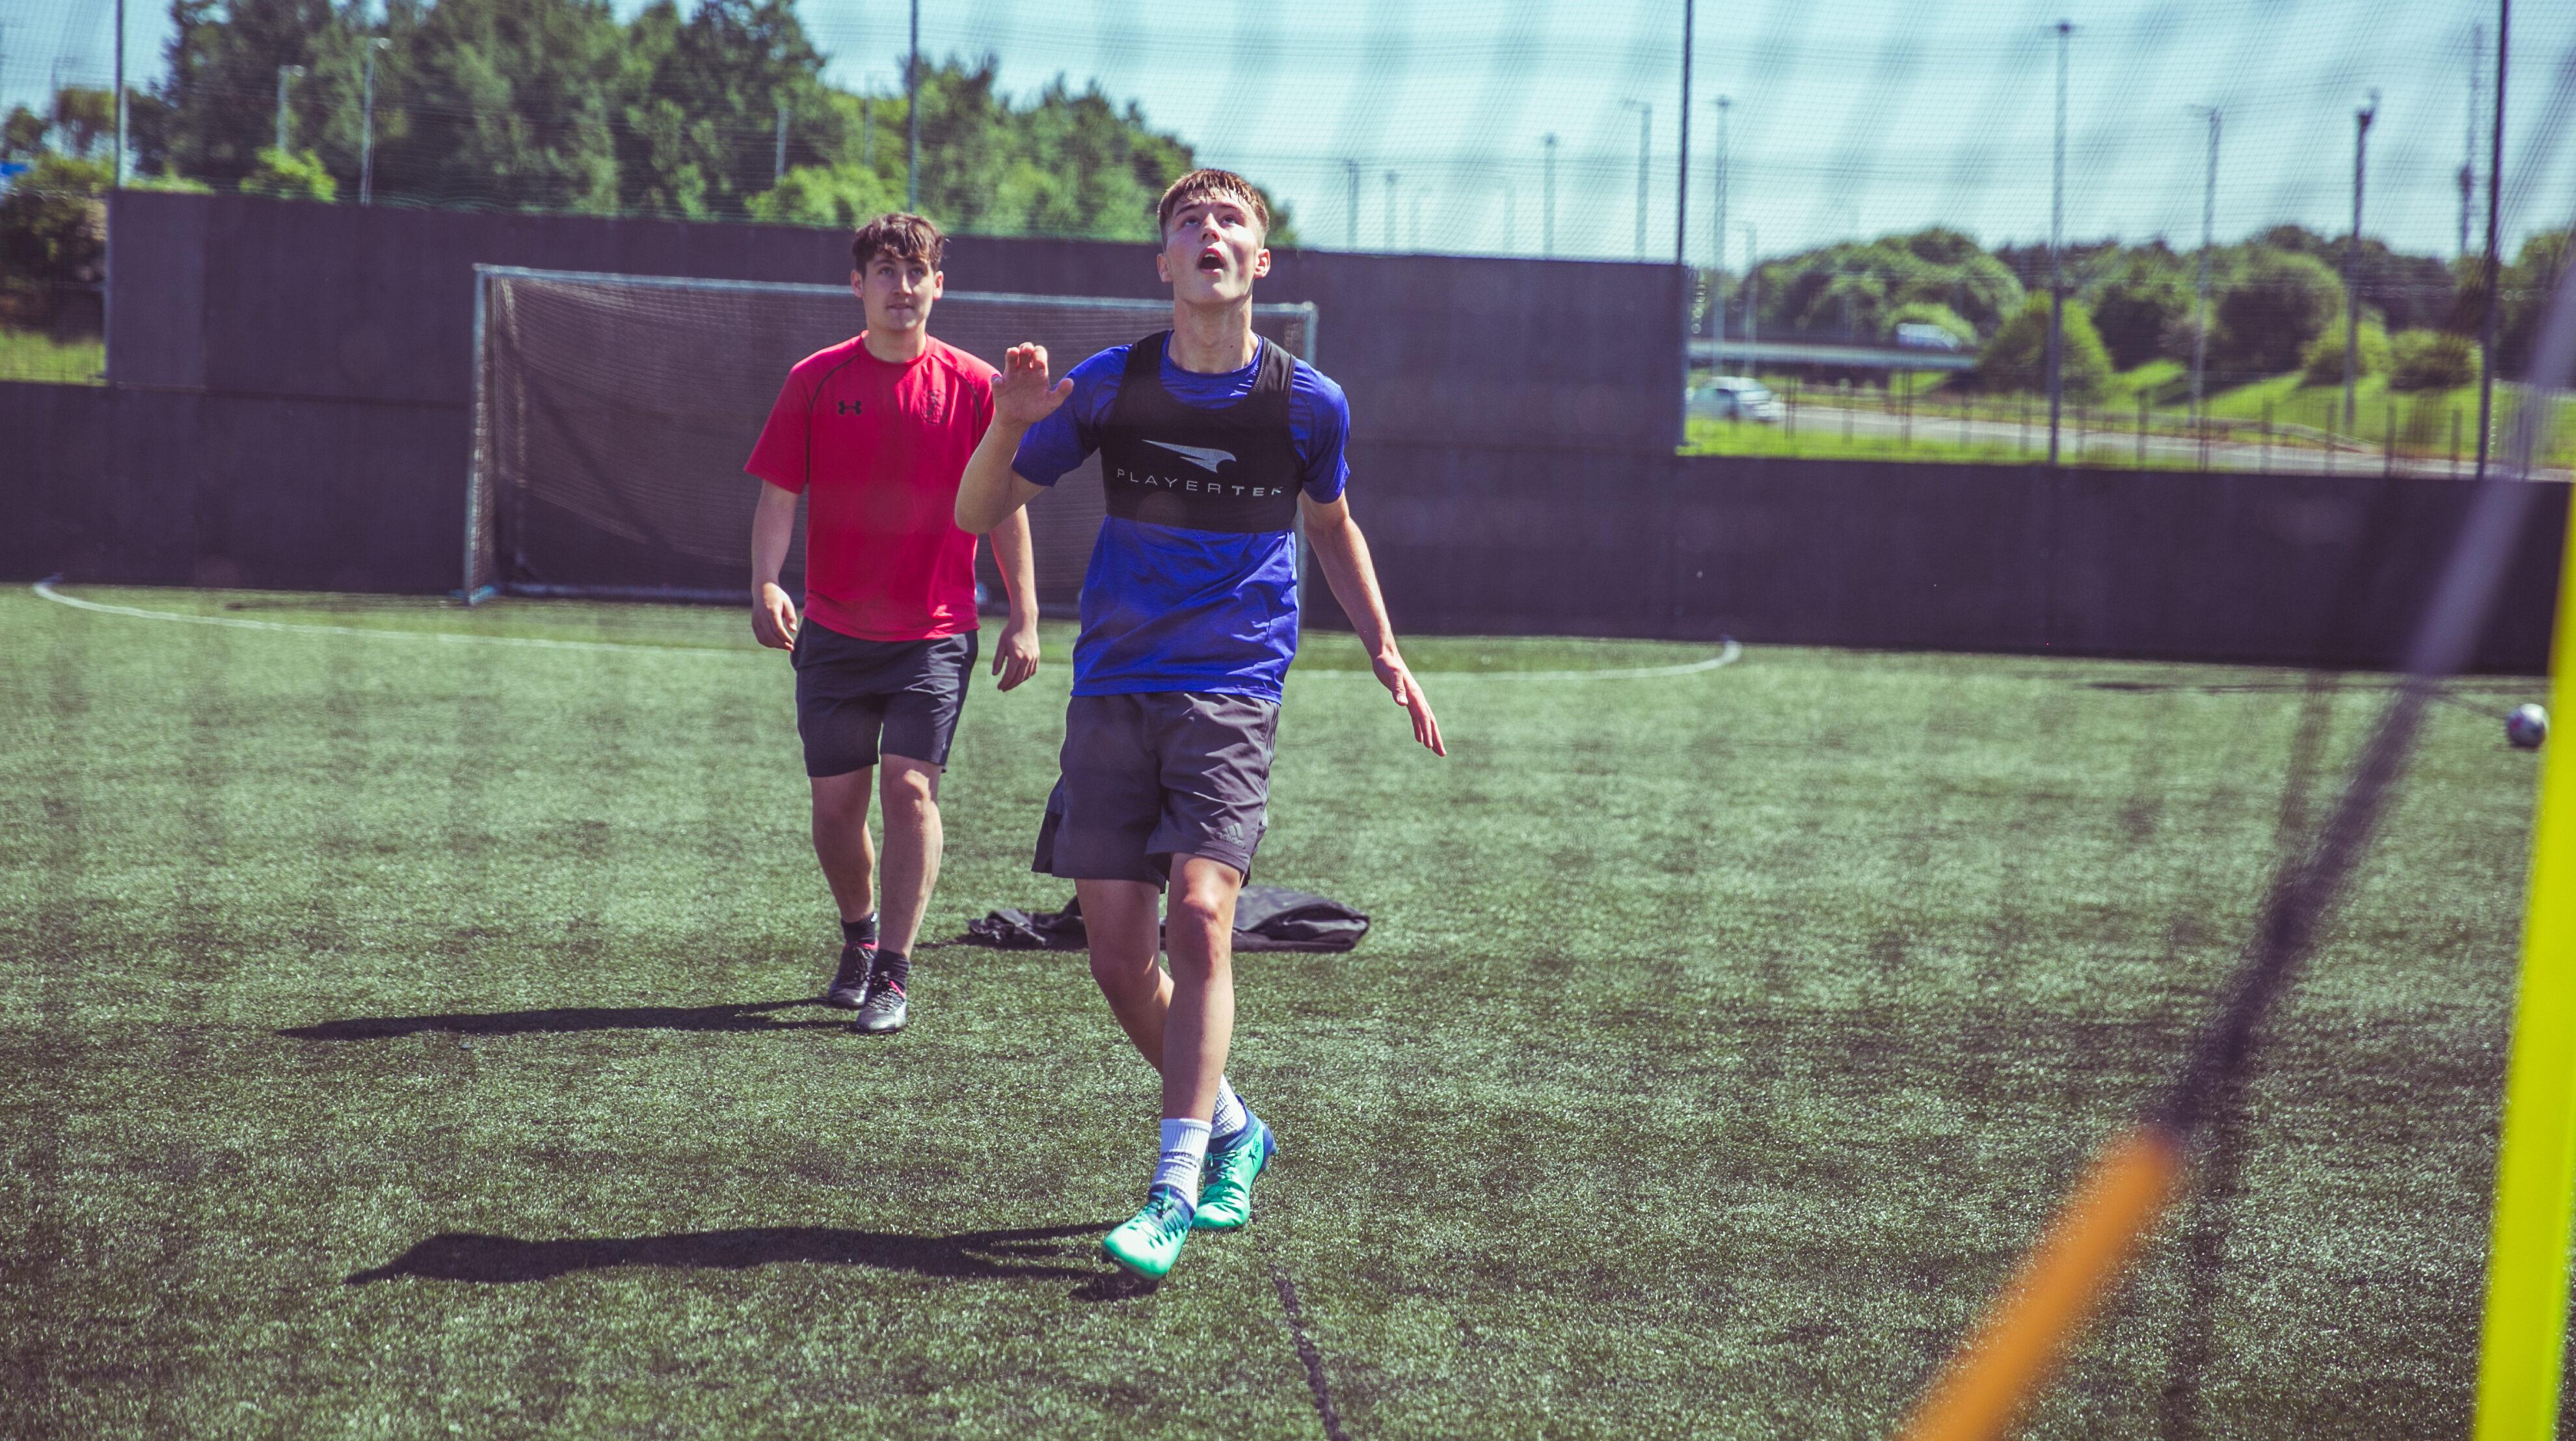 SportsLab Interviews: Harry Cochrane